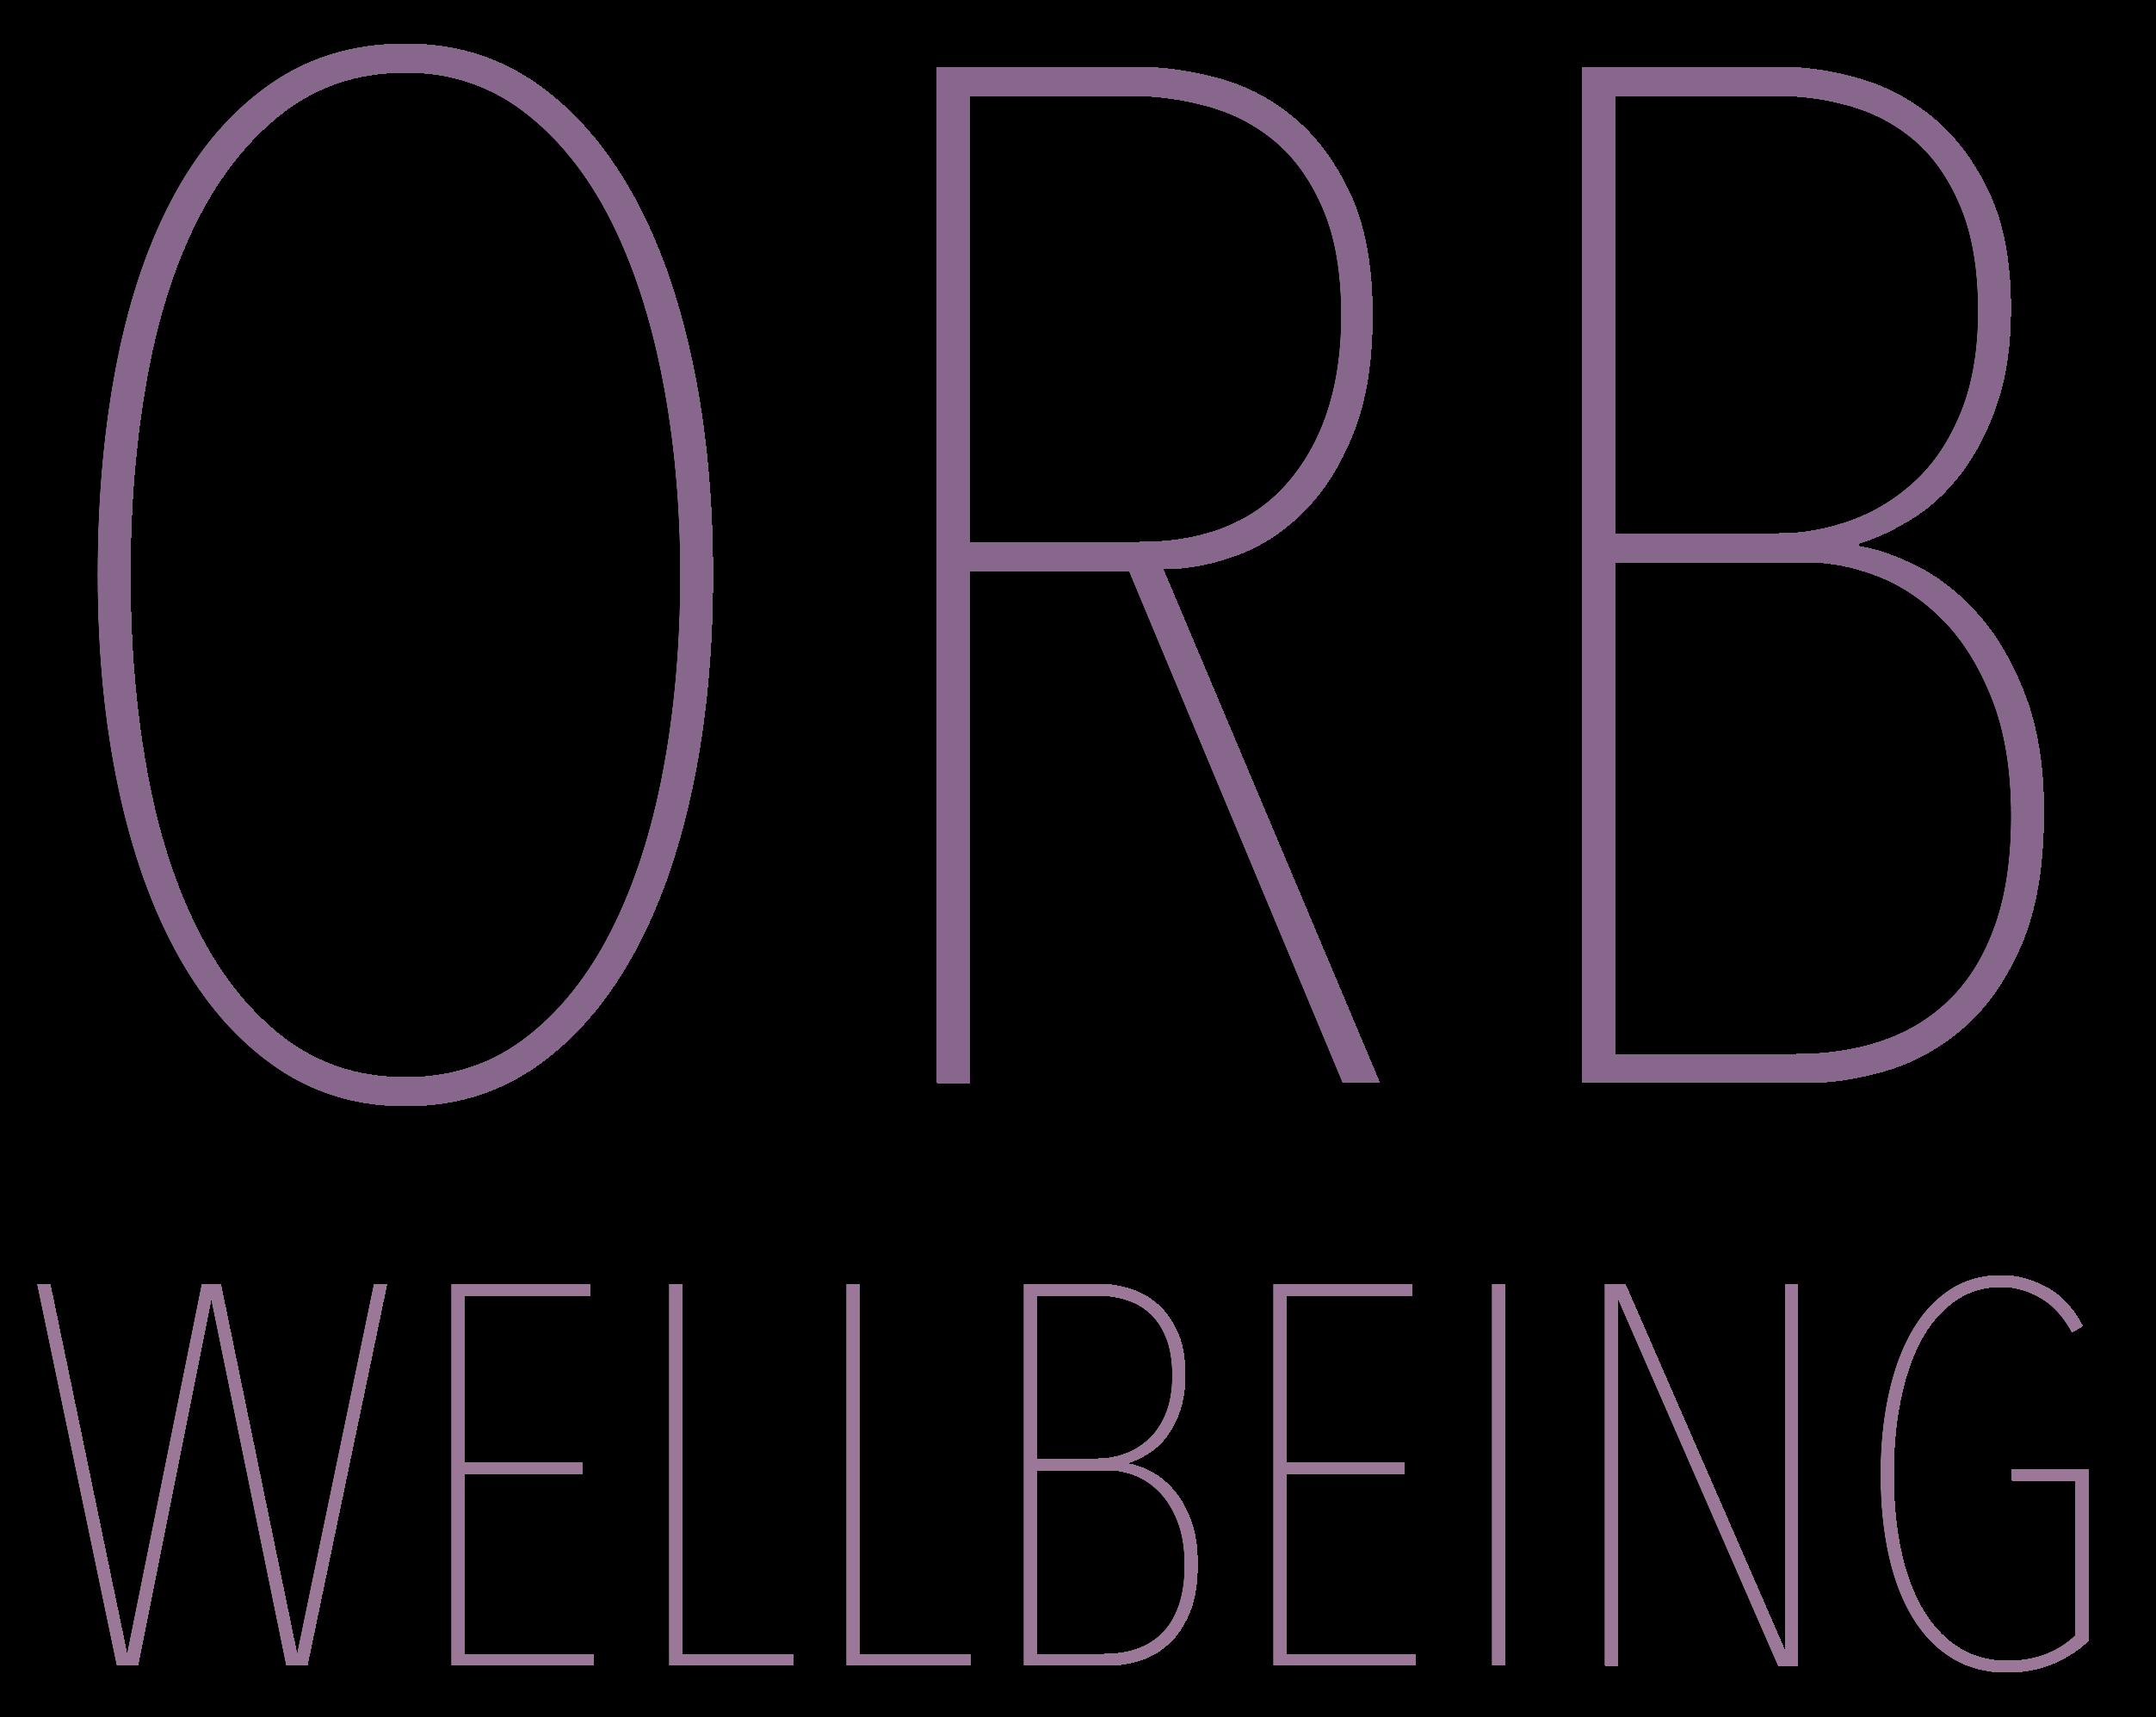 Orb Wellbeing